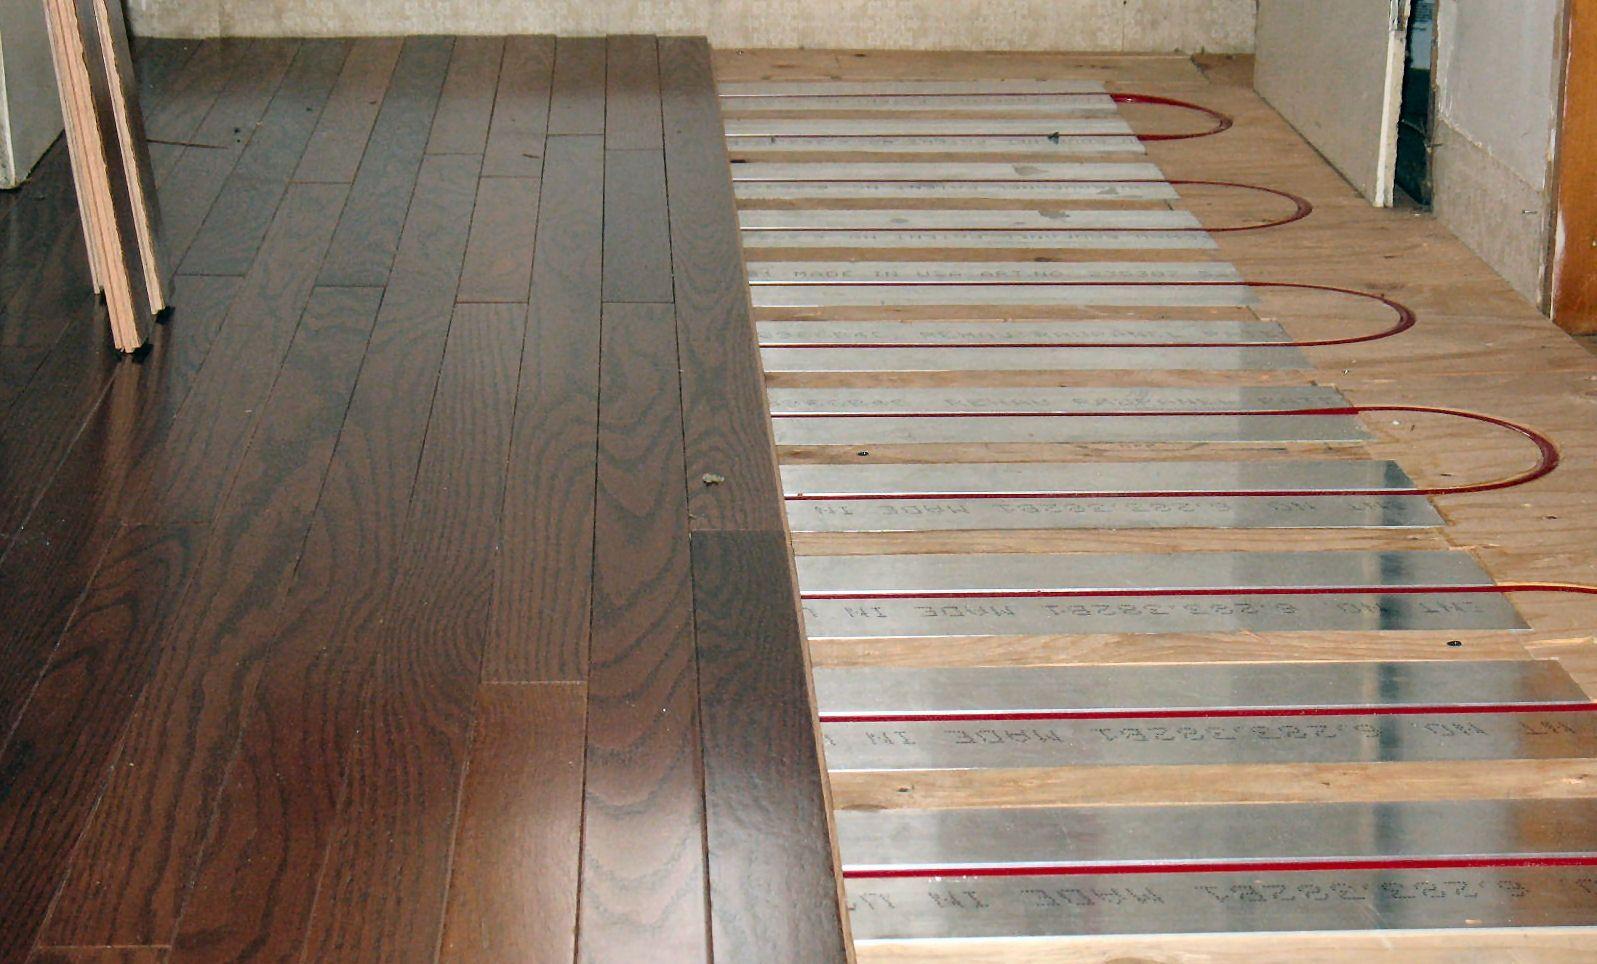 Radiant Heat Under Wood Floors Floor Heating Systems Radiant Floor Heating Hydronic Radiant Floor Heating